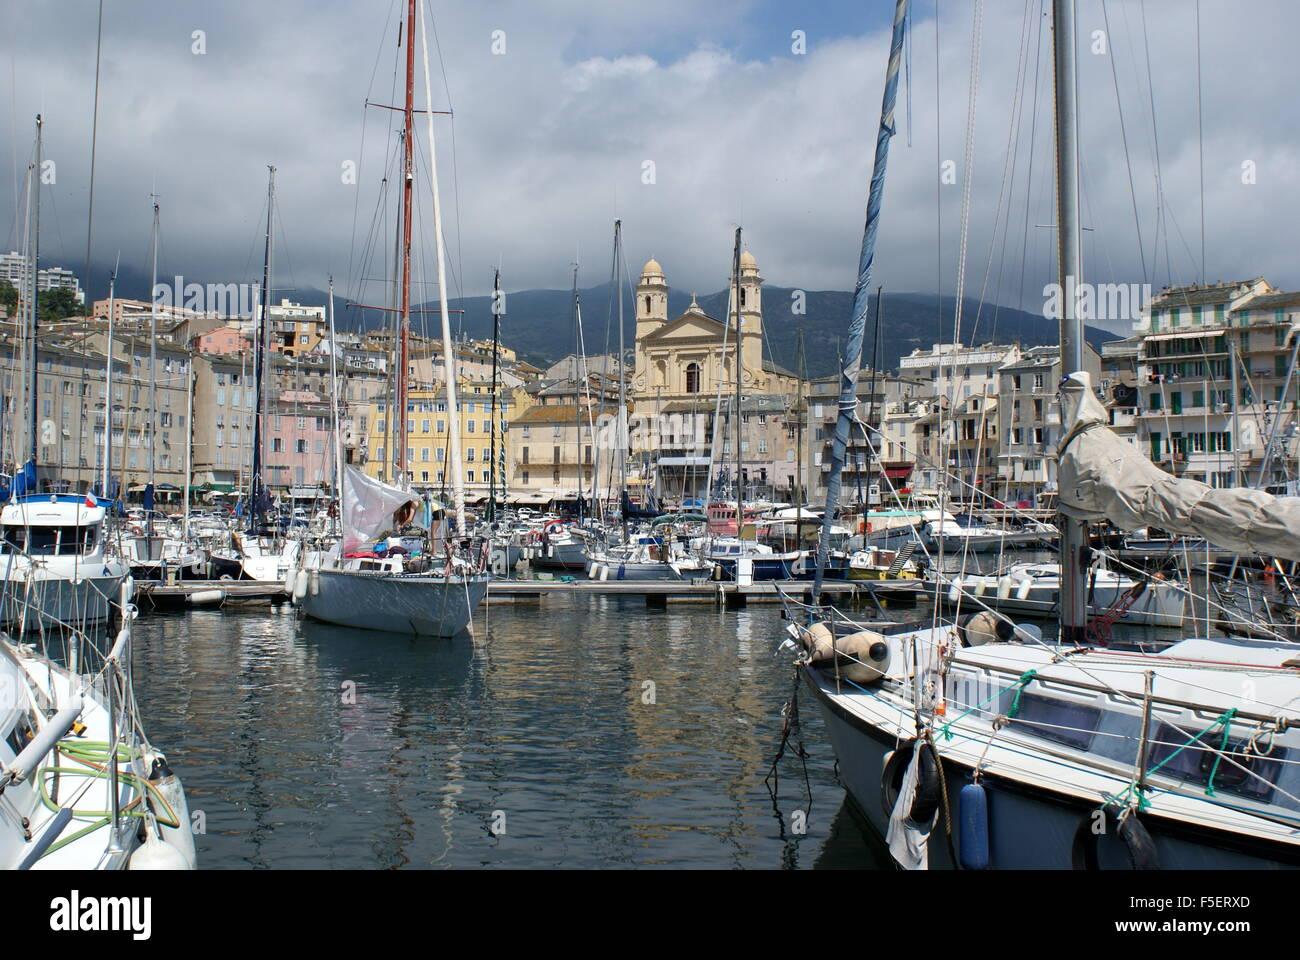 Old Port Bastia Corsica Stock Photo 89451221 Alamy